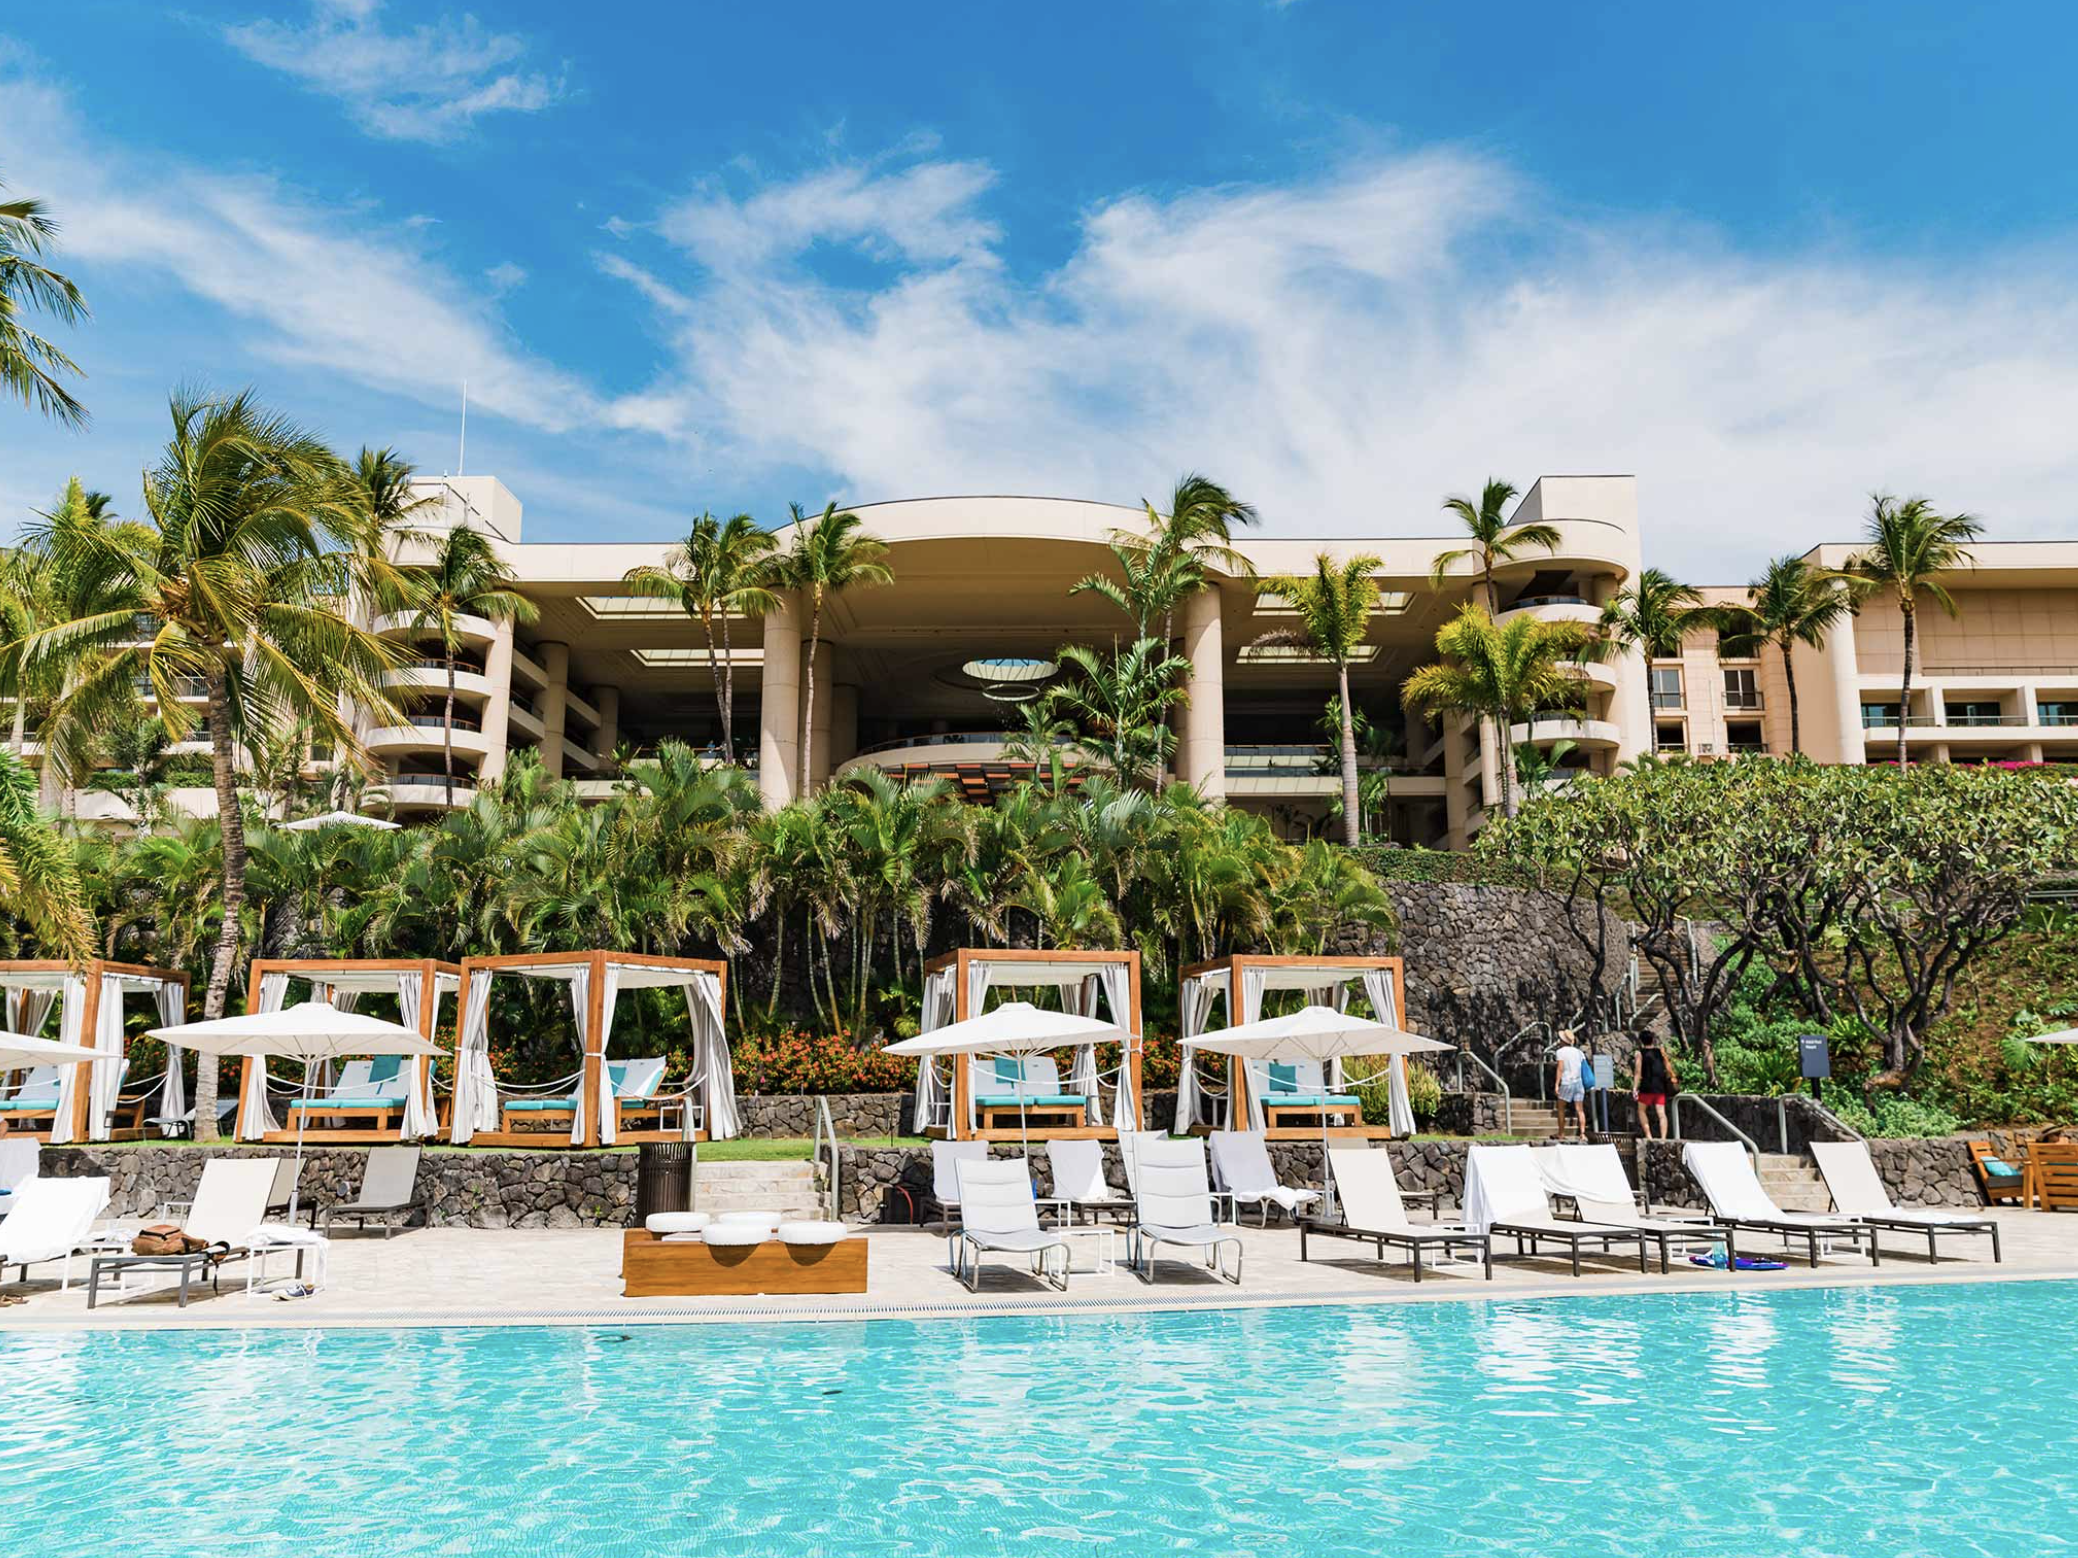 The Westing Hapuna Beach Resort Courtesy Photo